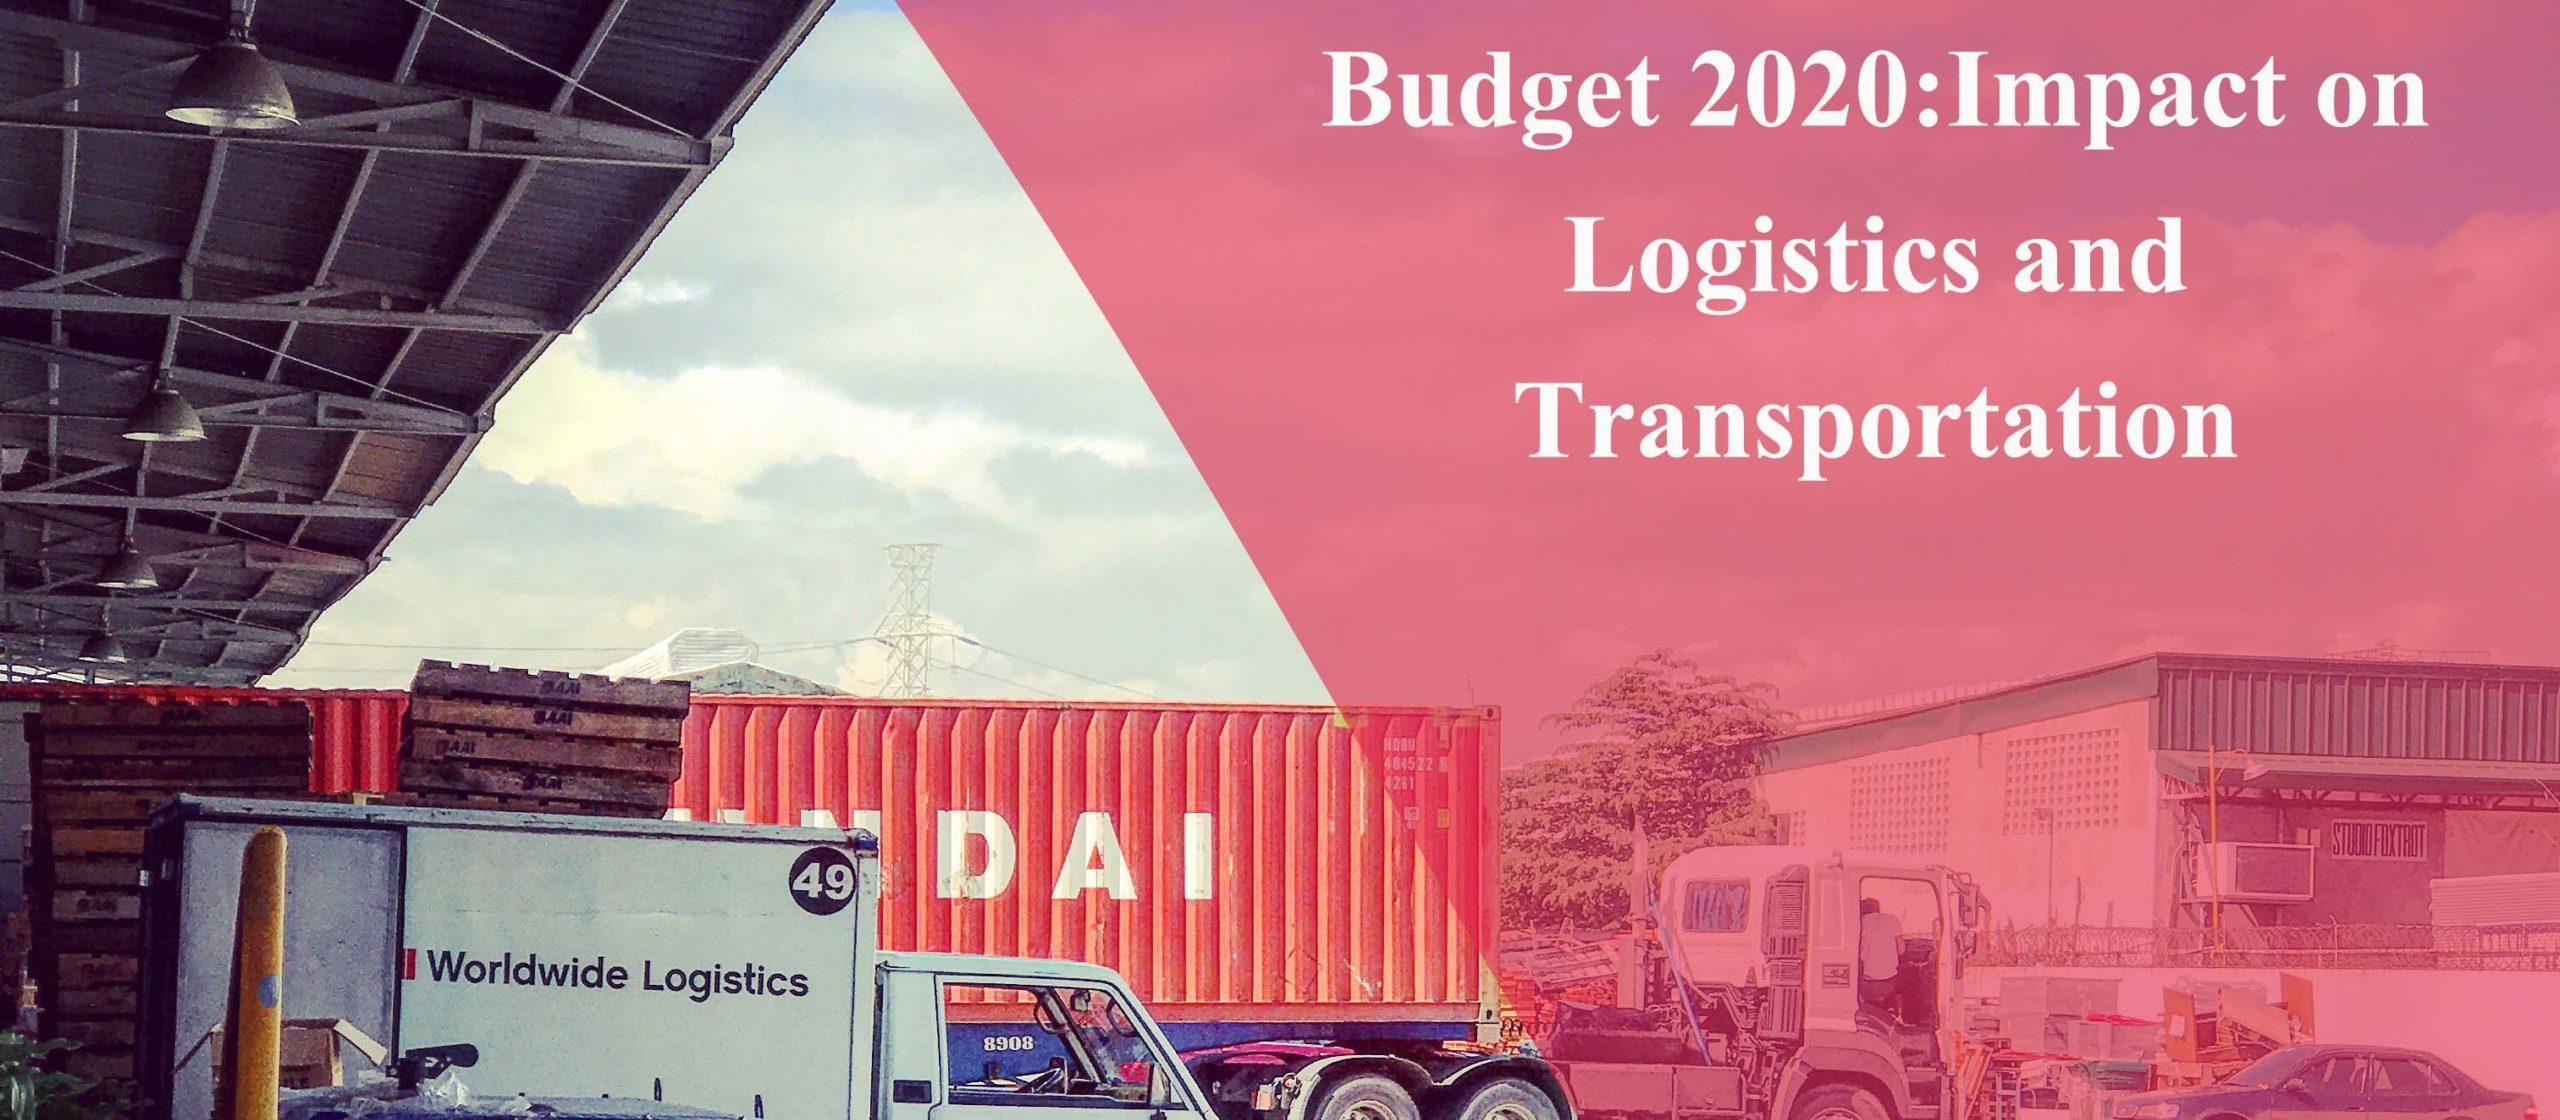 logistics budget 2020